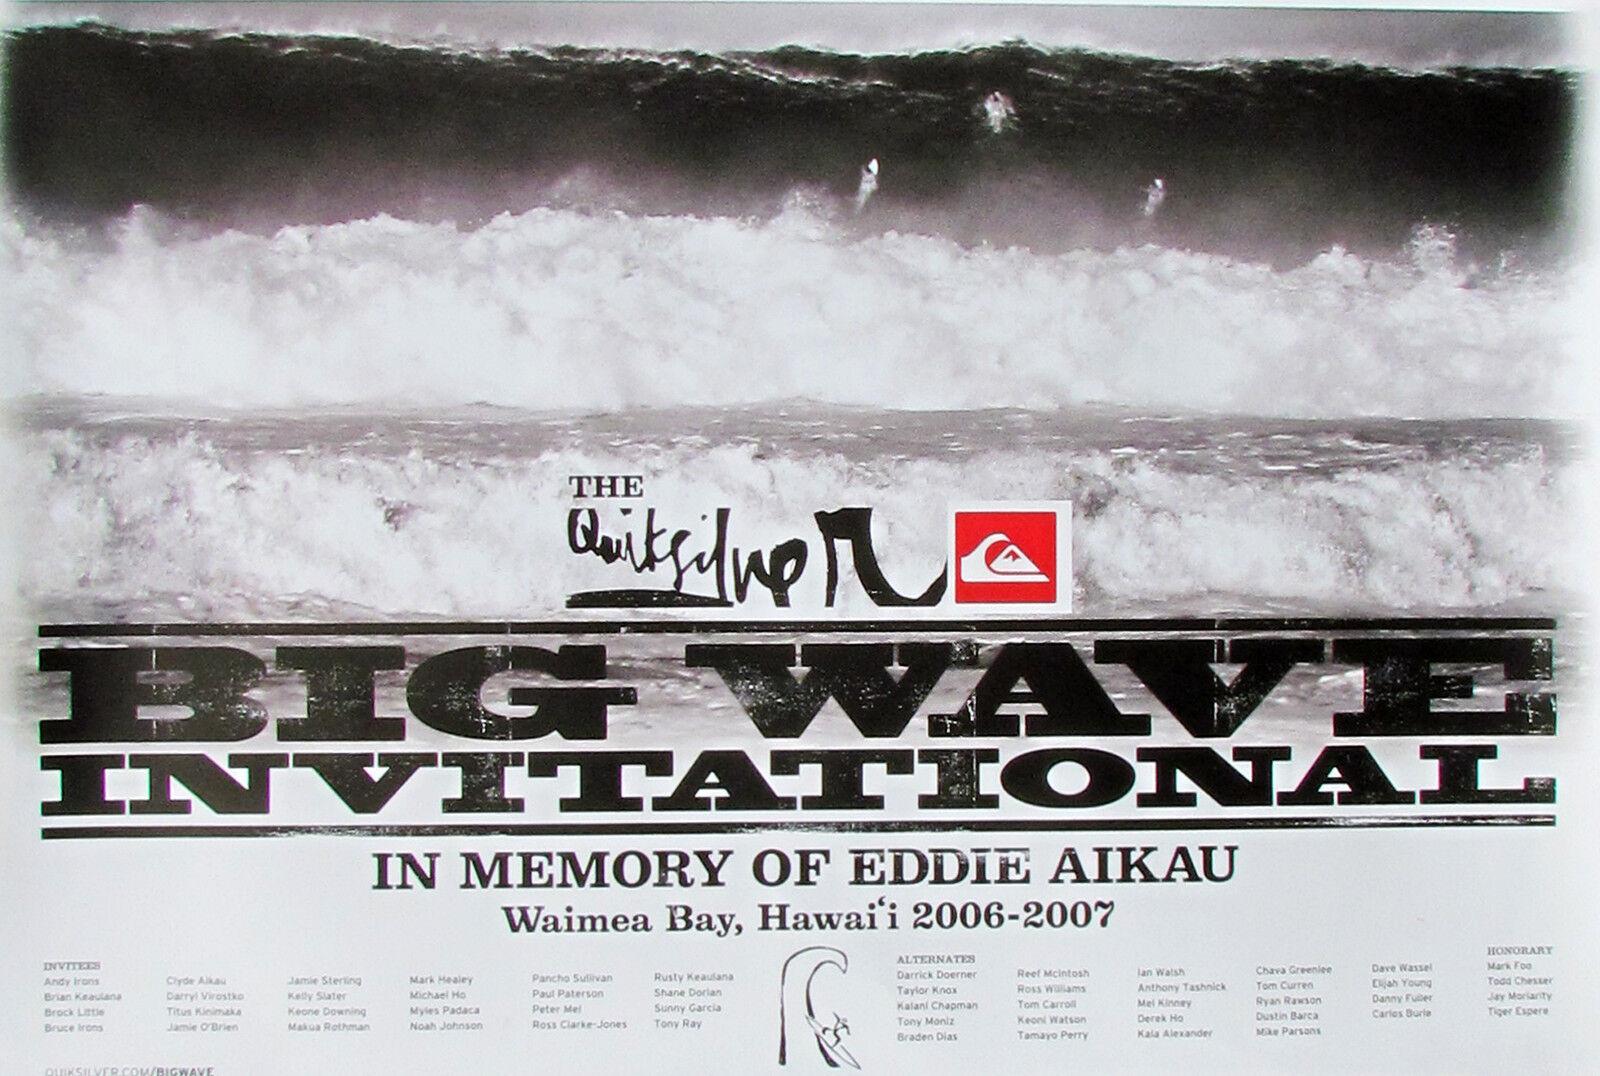 2006 Eddie Aikau Waimea Hawaii Original De Menta Big Wave Surfing concurso Cochetel